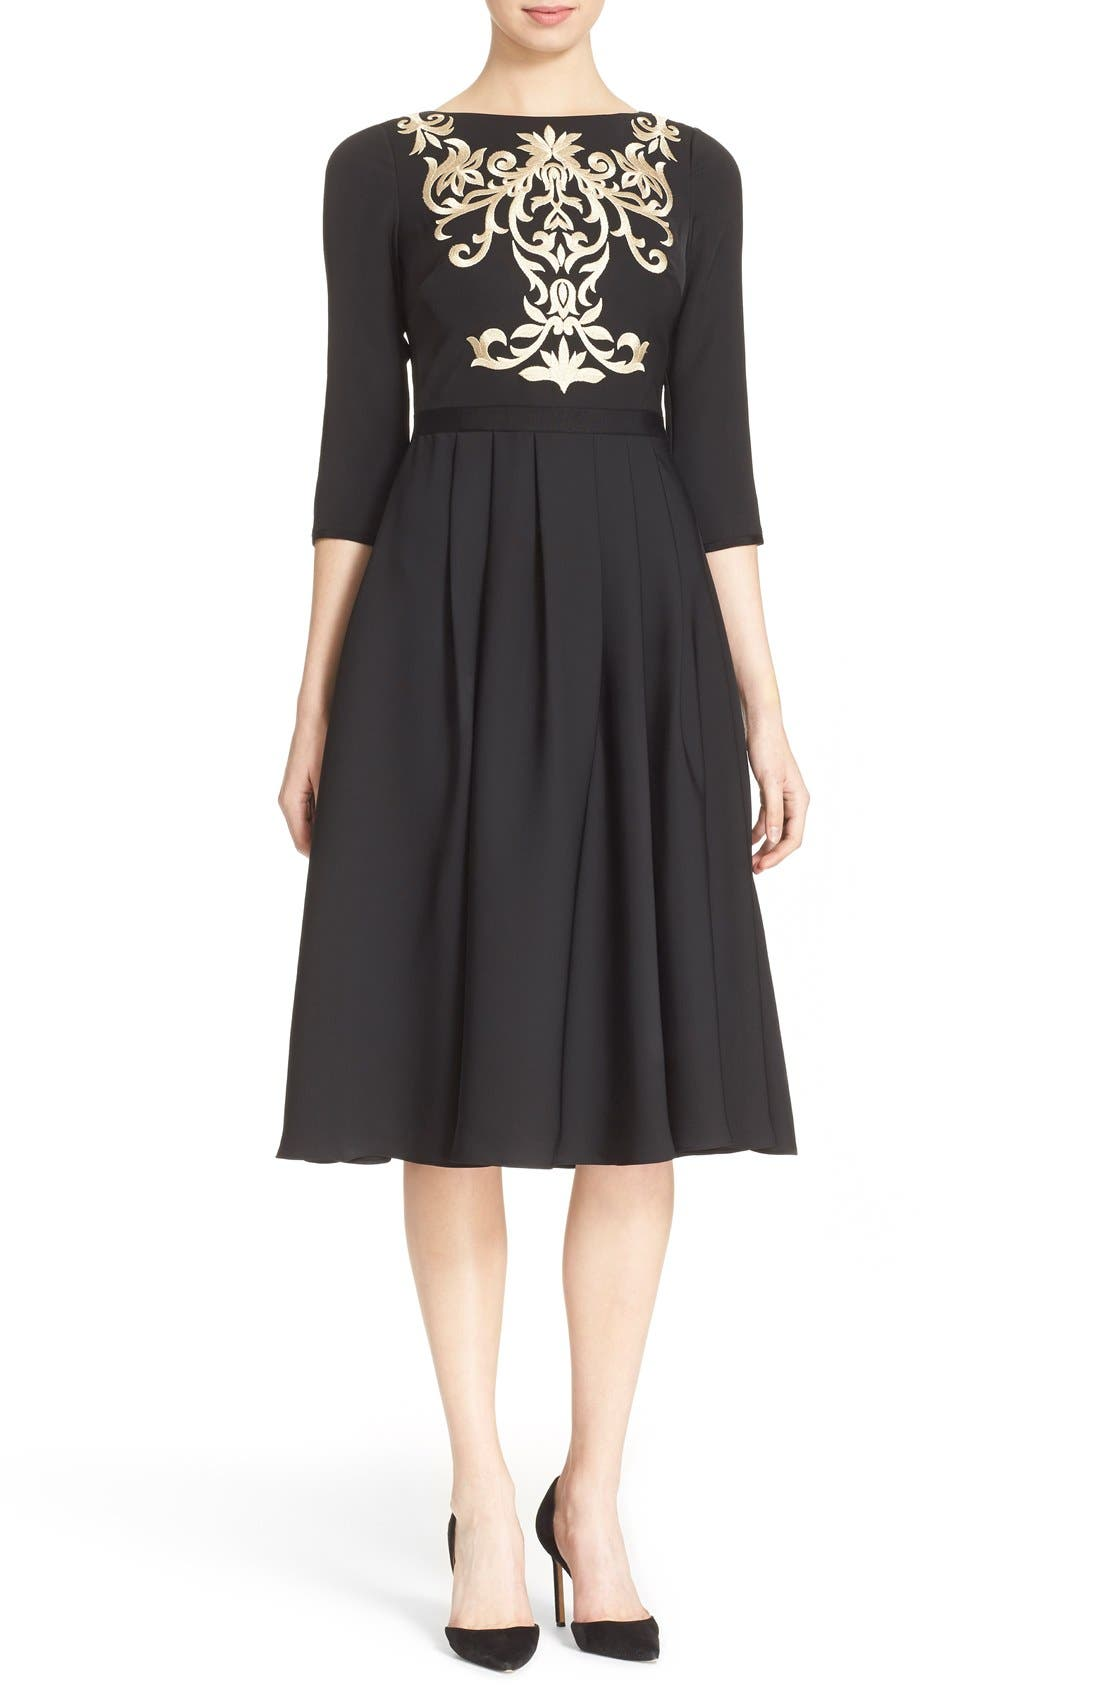 Main Image - Ted Baker London 'Shamari' Embroidered Bodice Midi Dress